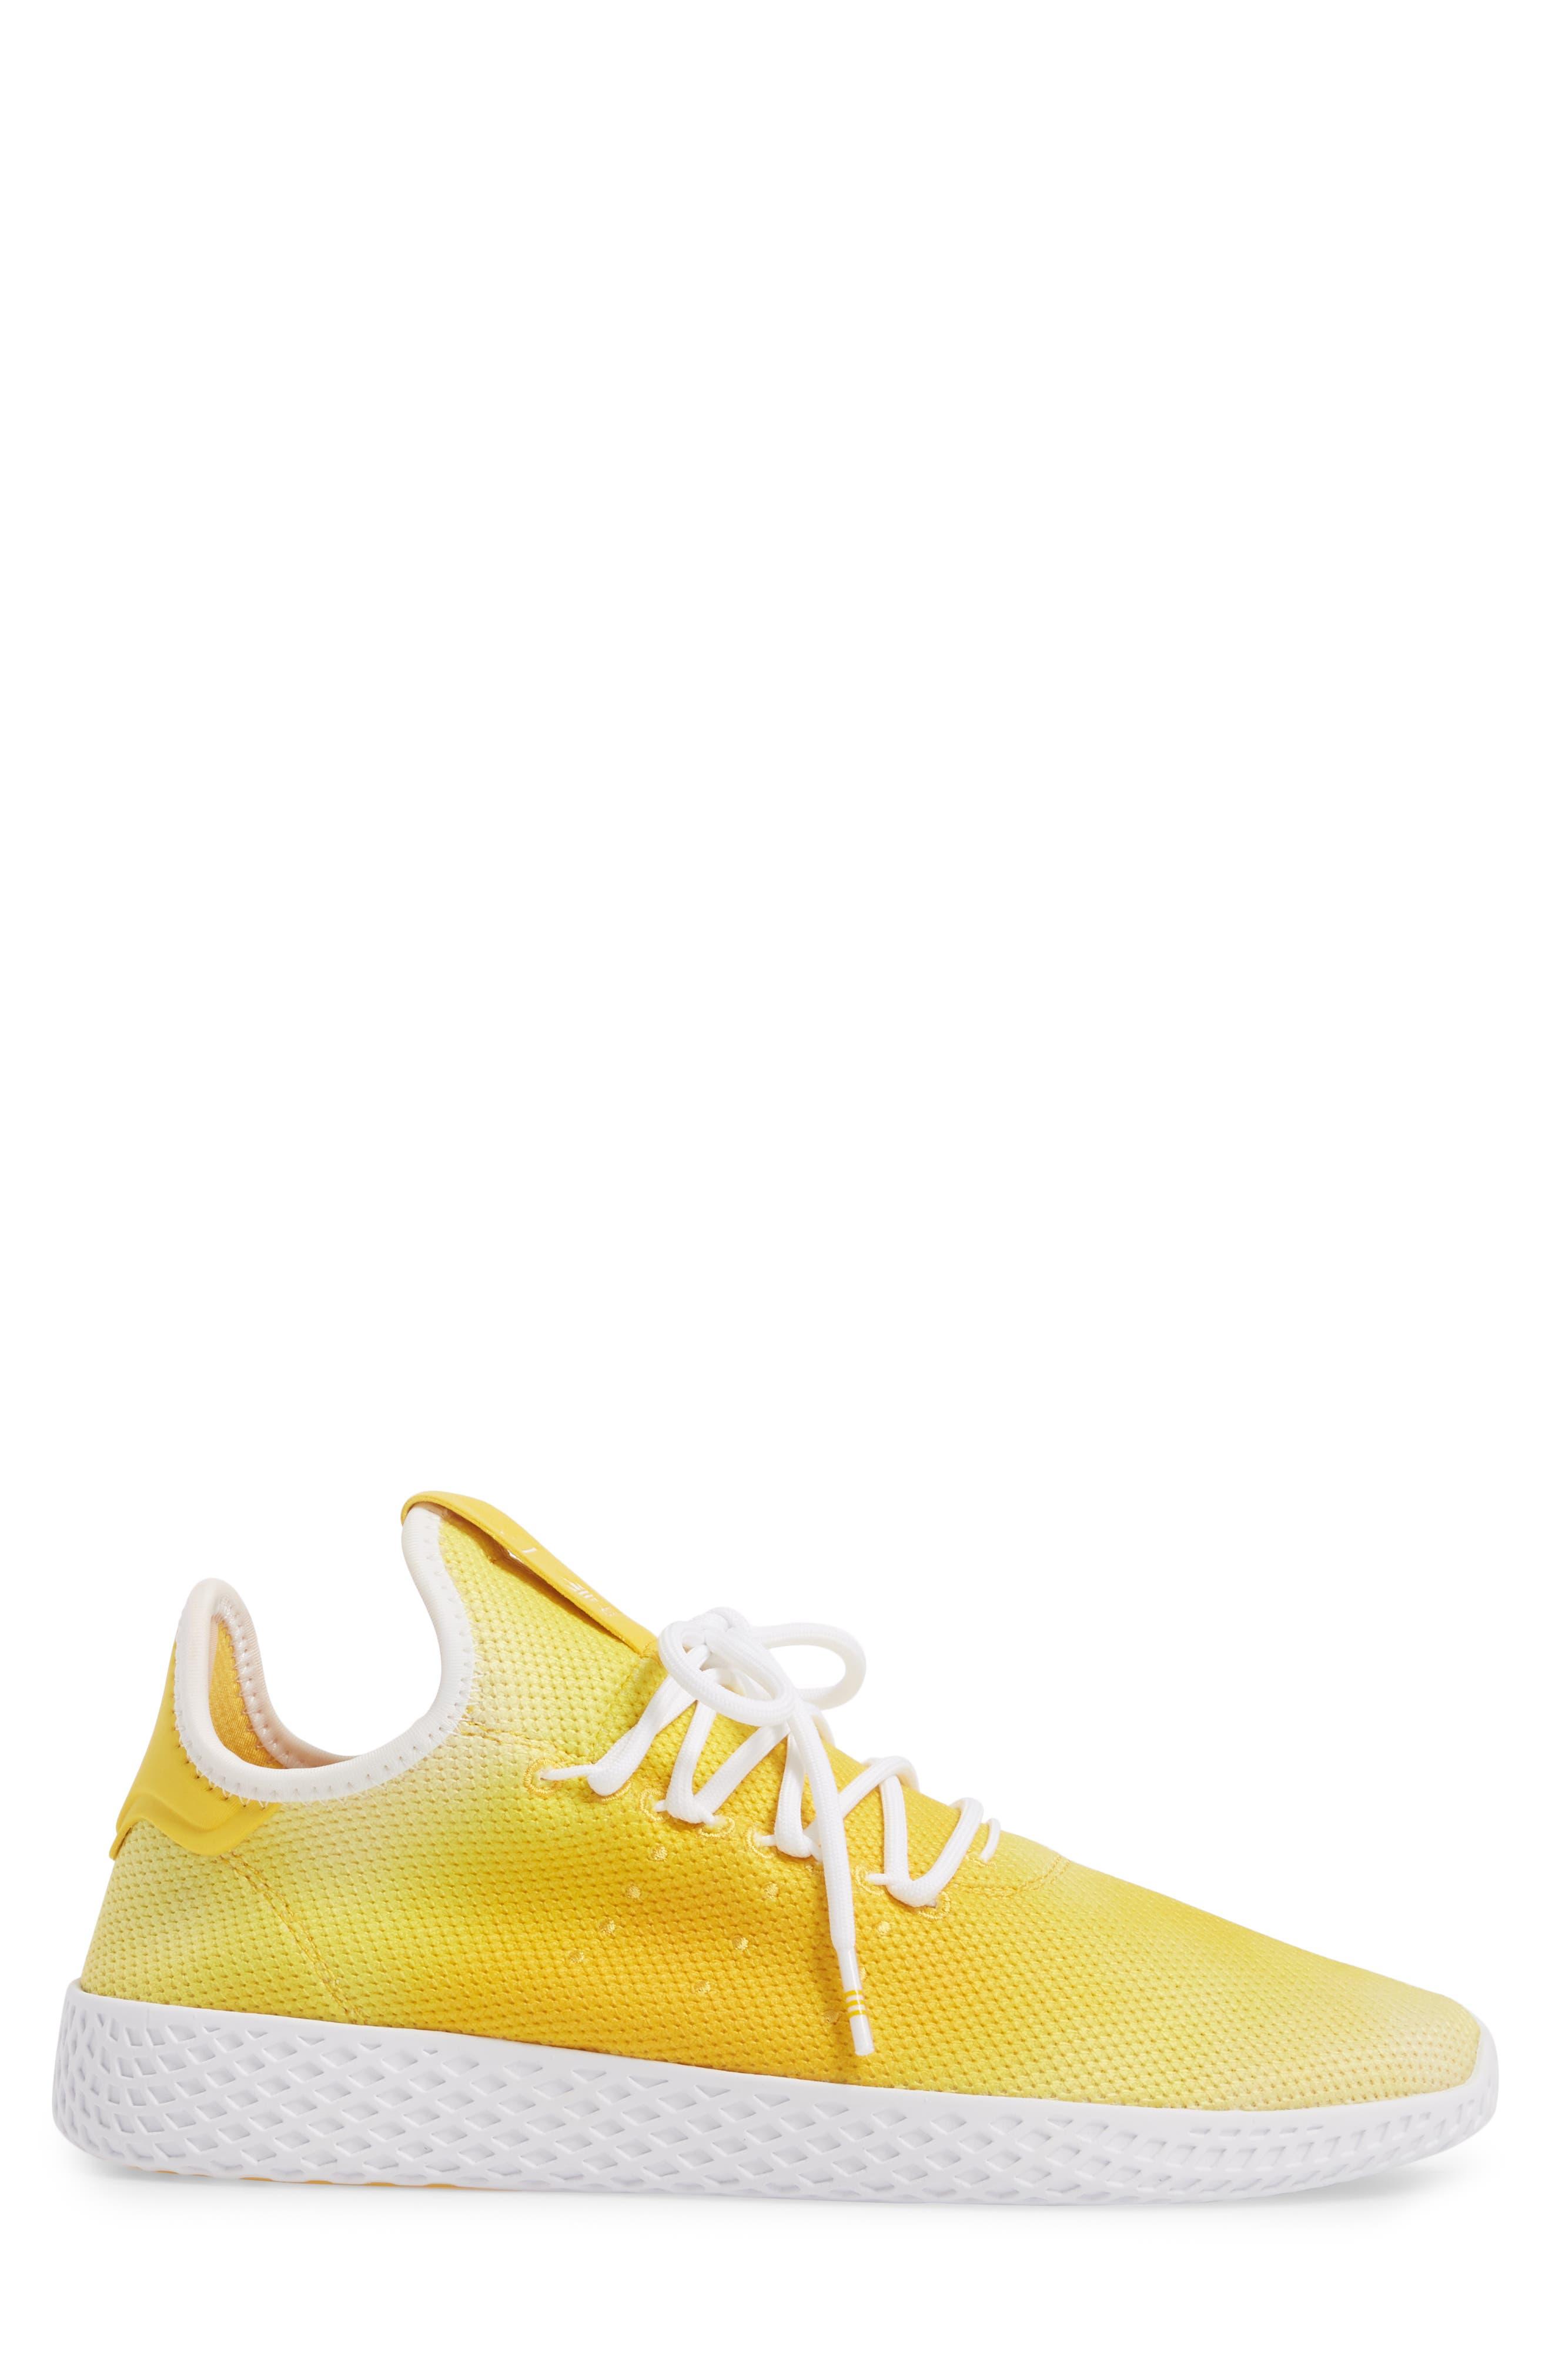 Pharrell Williams Tennis Hu Sneaker,                             Alternate thumbnail 3, color,                             YELLOW/ WHITE